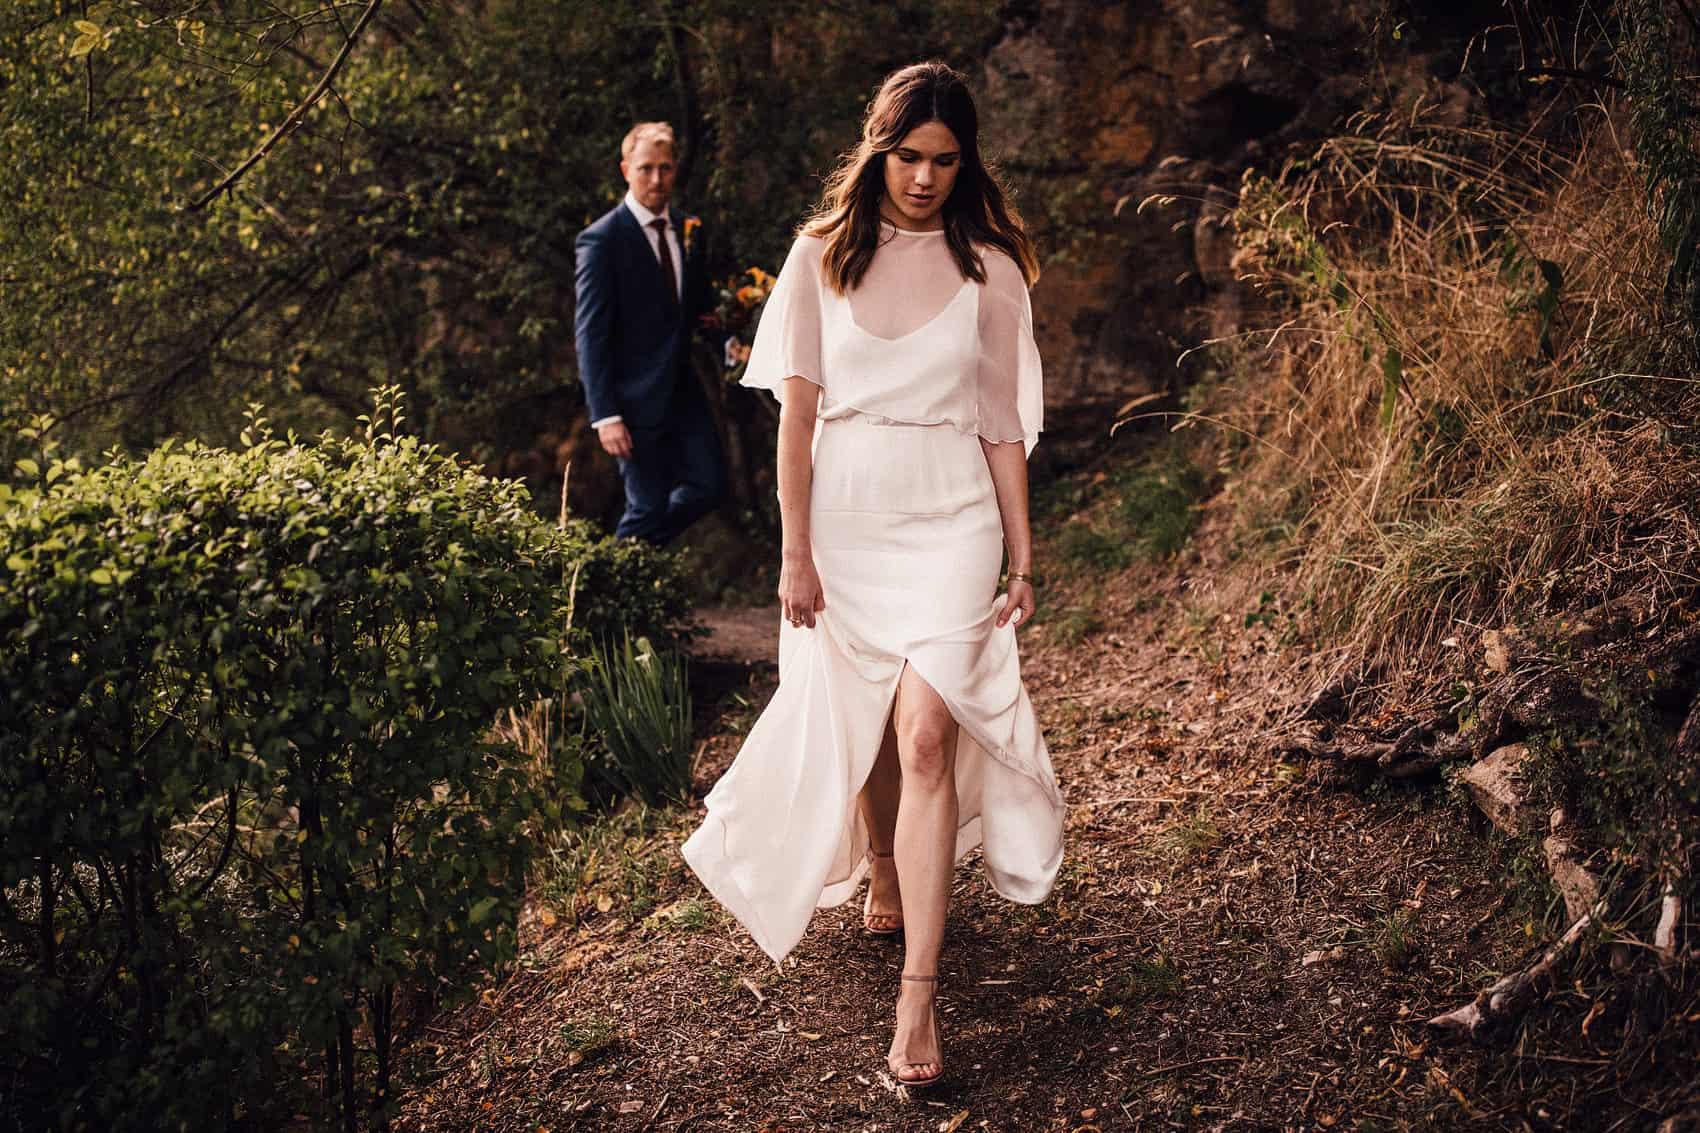 Lena Medoyeff Bridal wedding dress